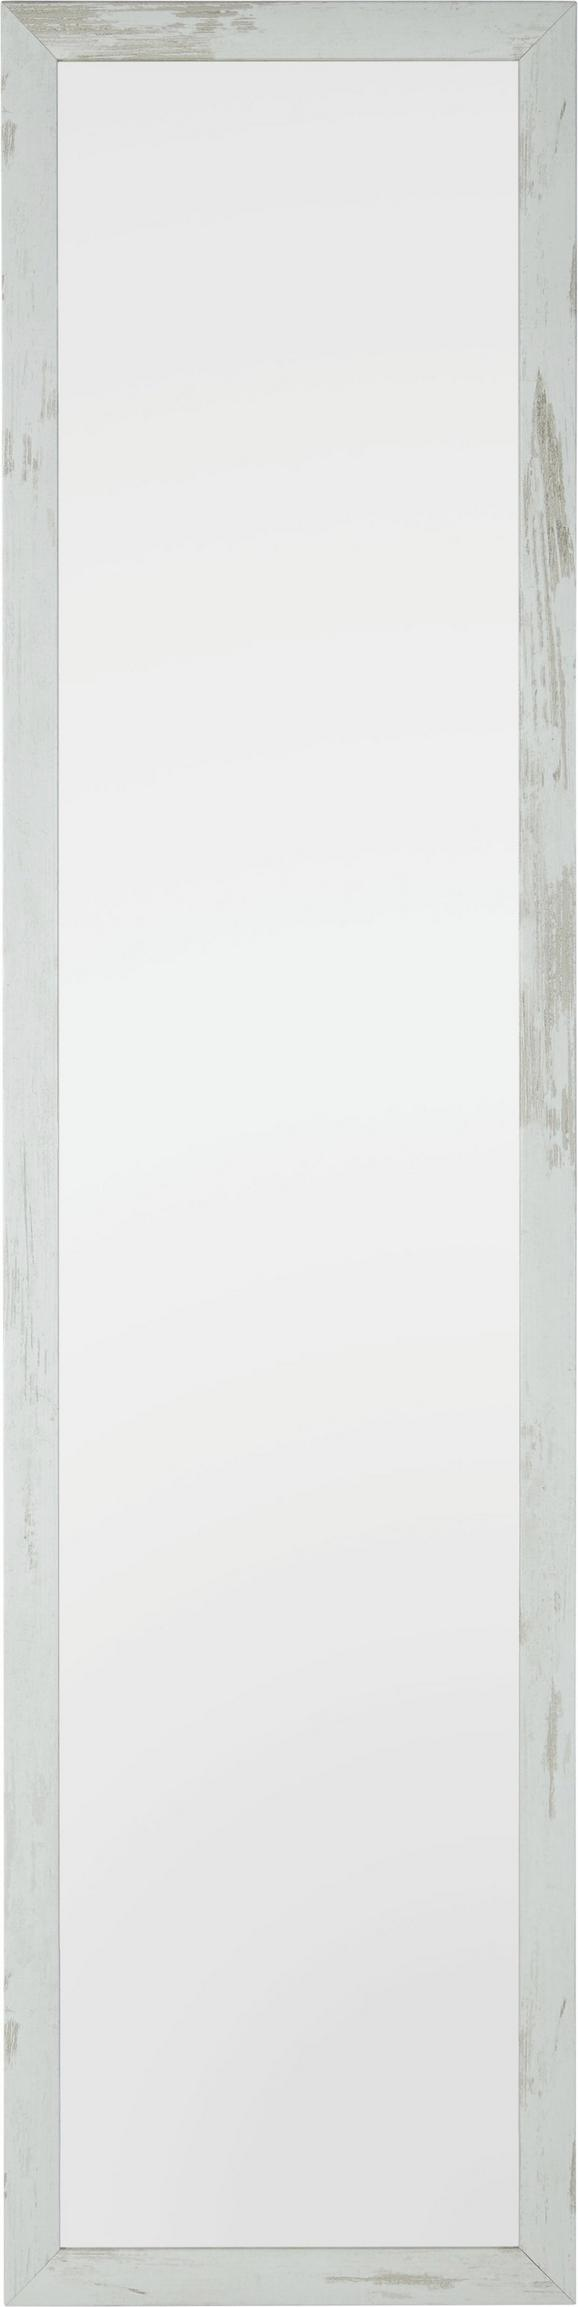 Wandspiegel ca. 40x160x2cm - Weiß, Glas/Holzwerkstoff (40/160/2cm) - Mömax modern living